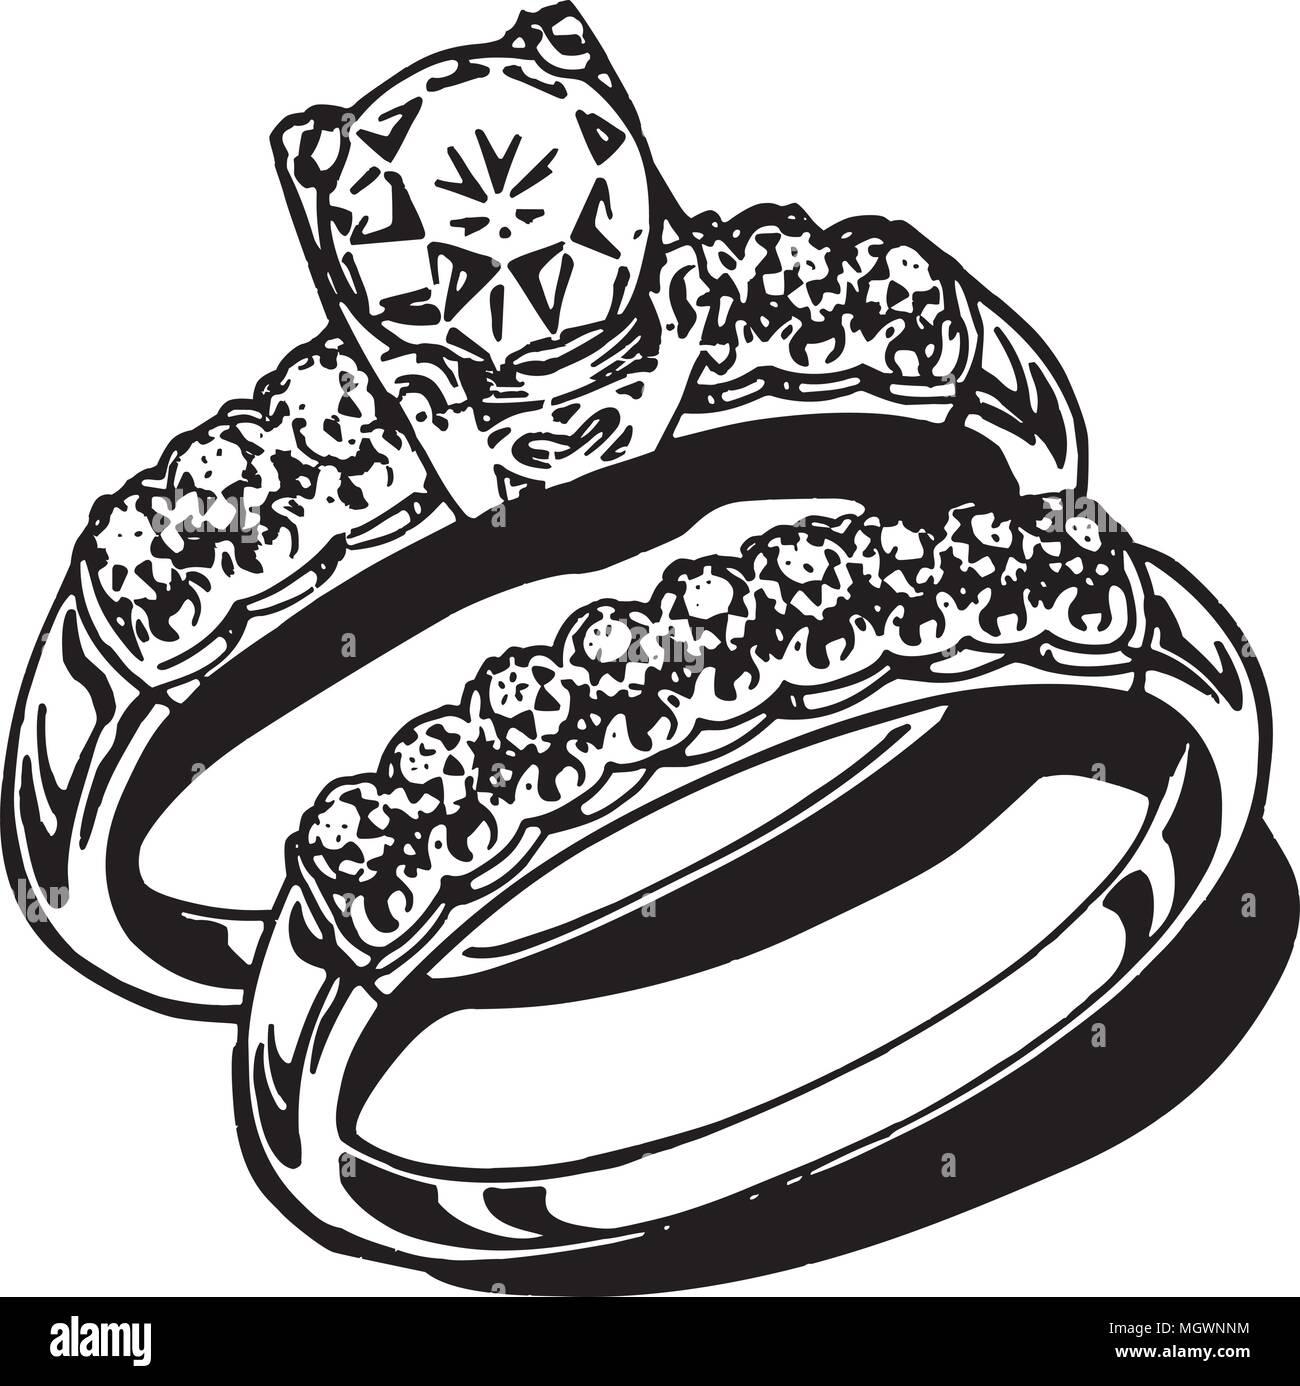 hight resolution of wedding rings retro clipart illustration